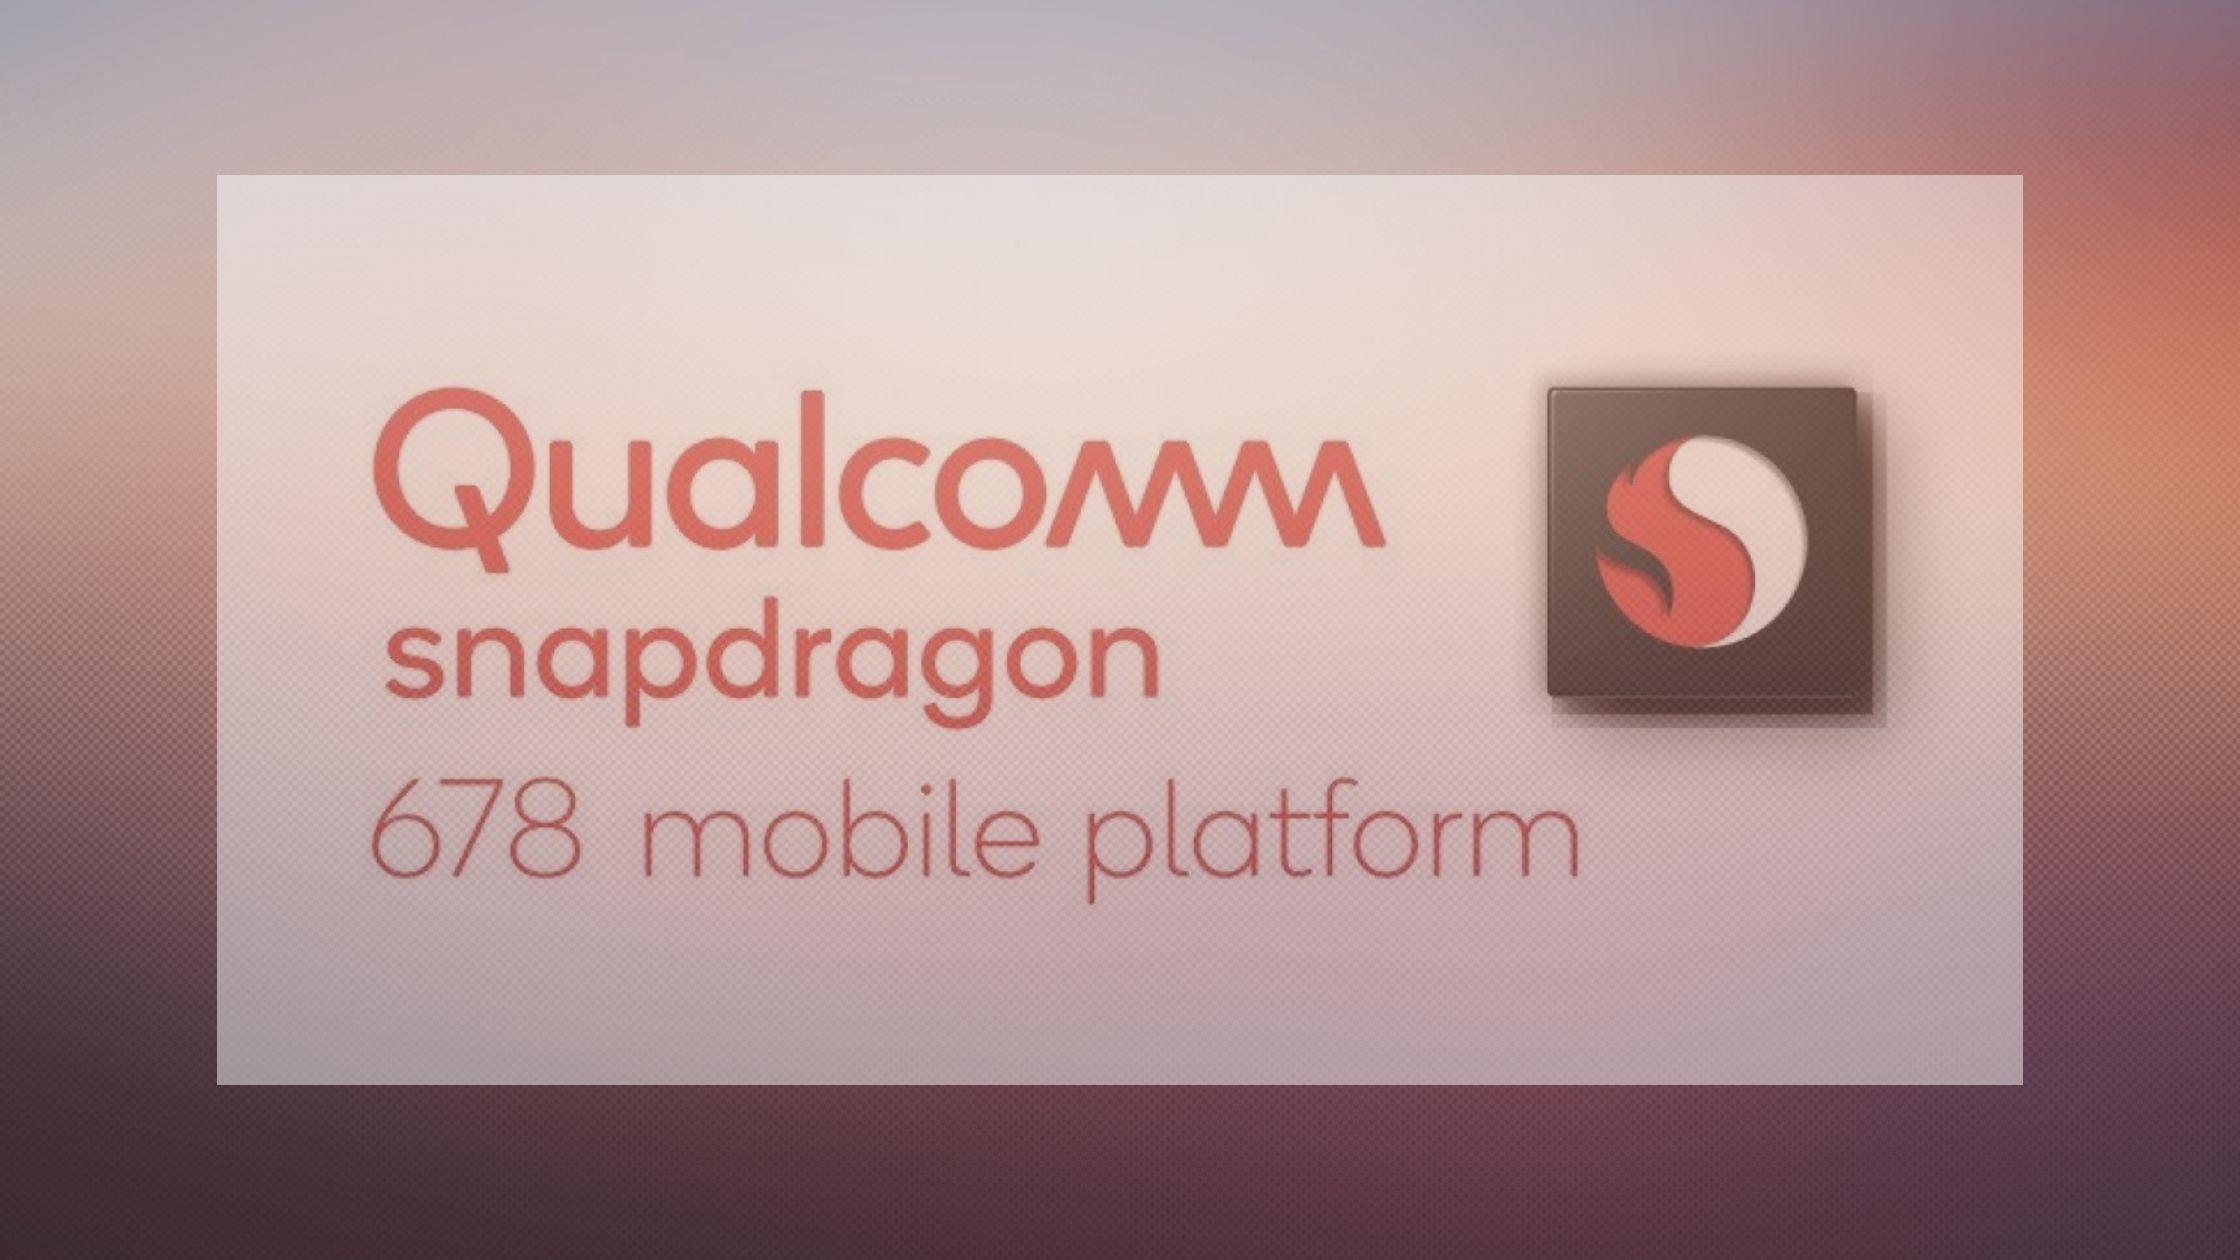 Qualcomm Snapdragon 687